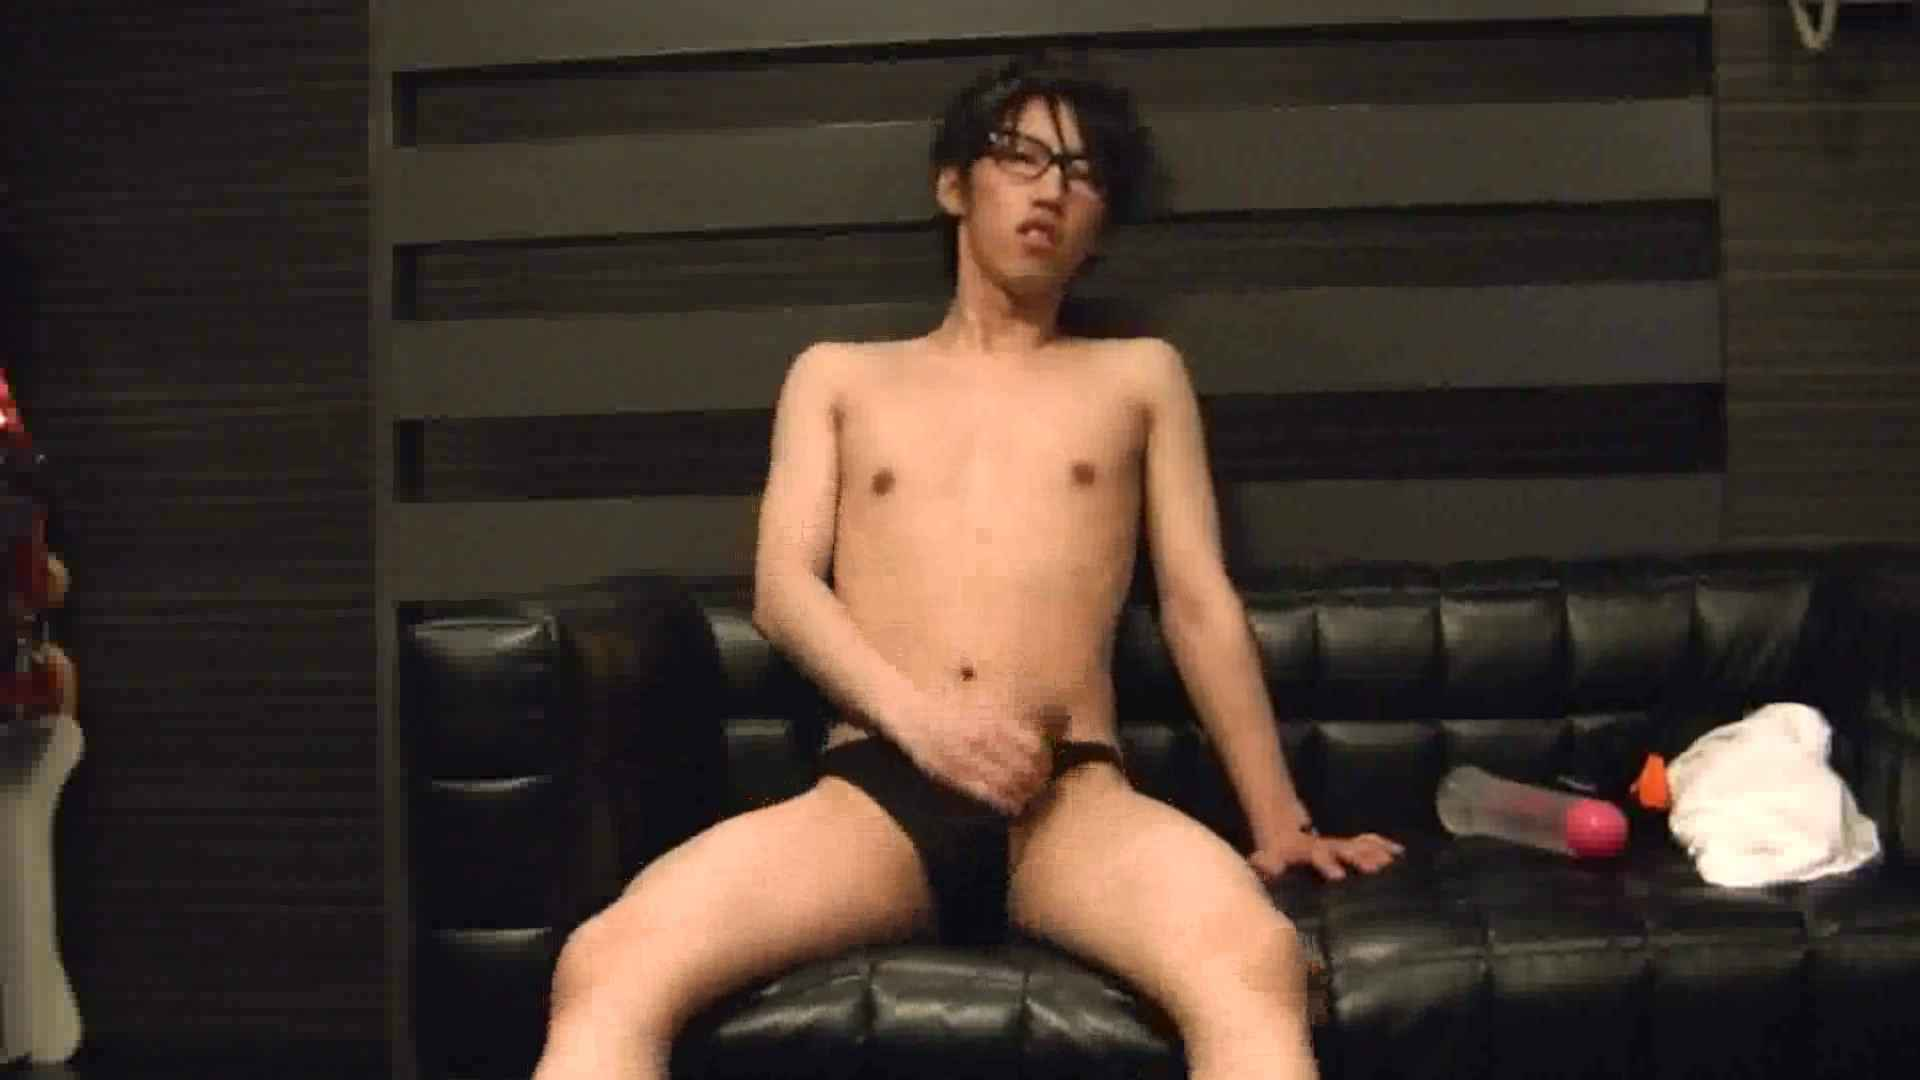 ONA見せカーニバル!! Vol3 モザ無し ゲイ無修正画像 87枚 45